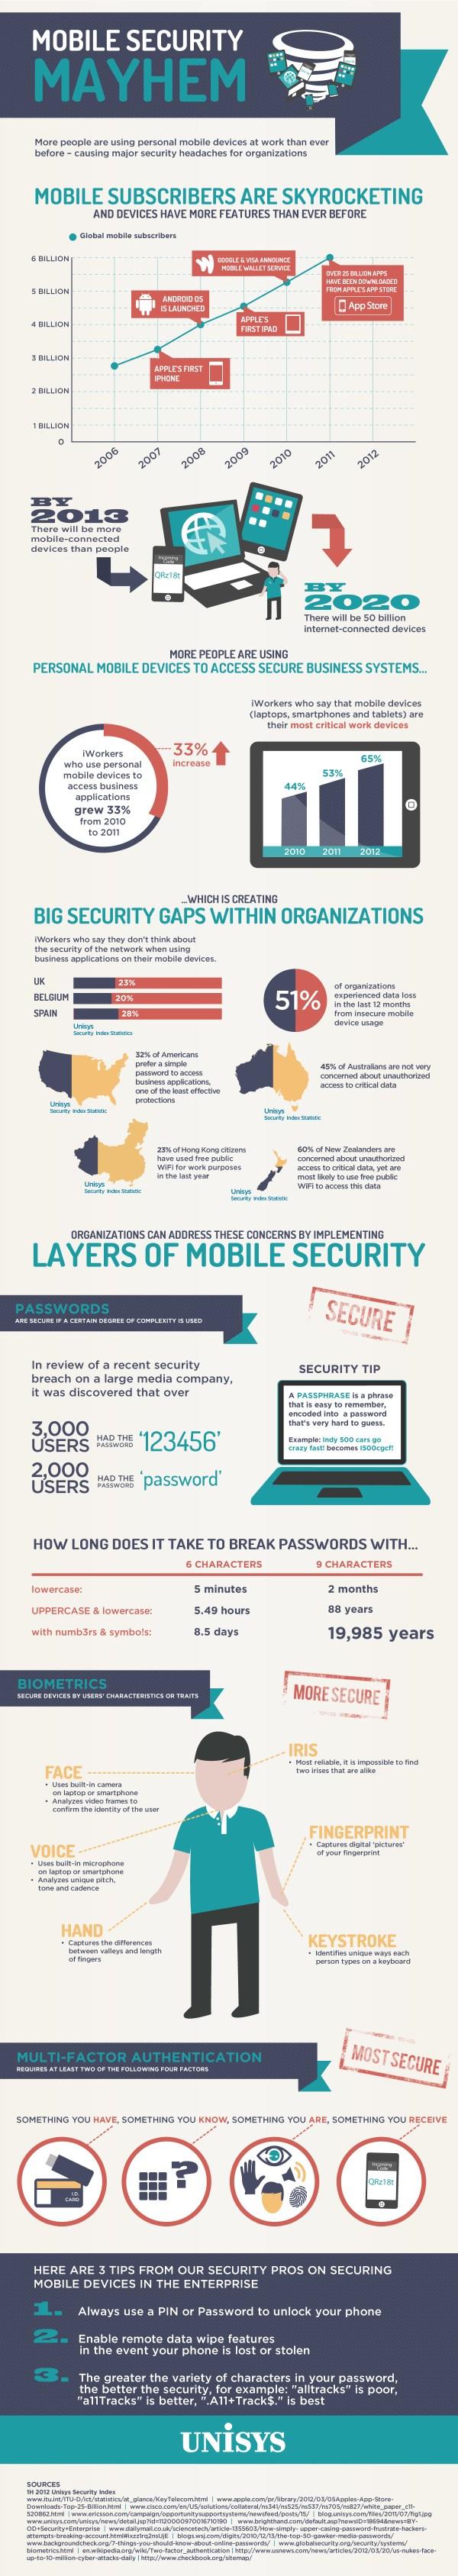 Mobile Security Mayhem